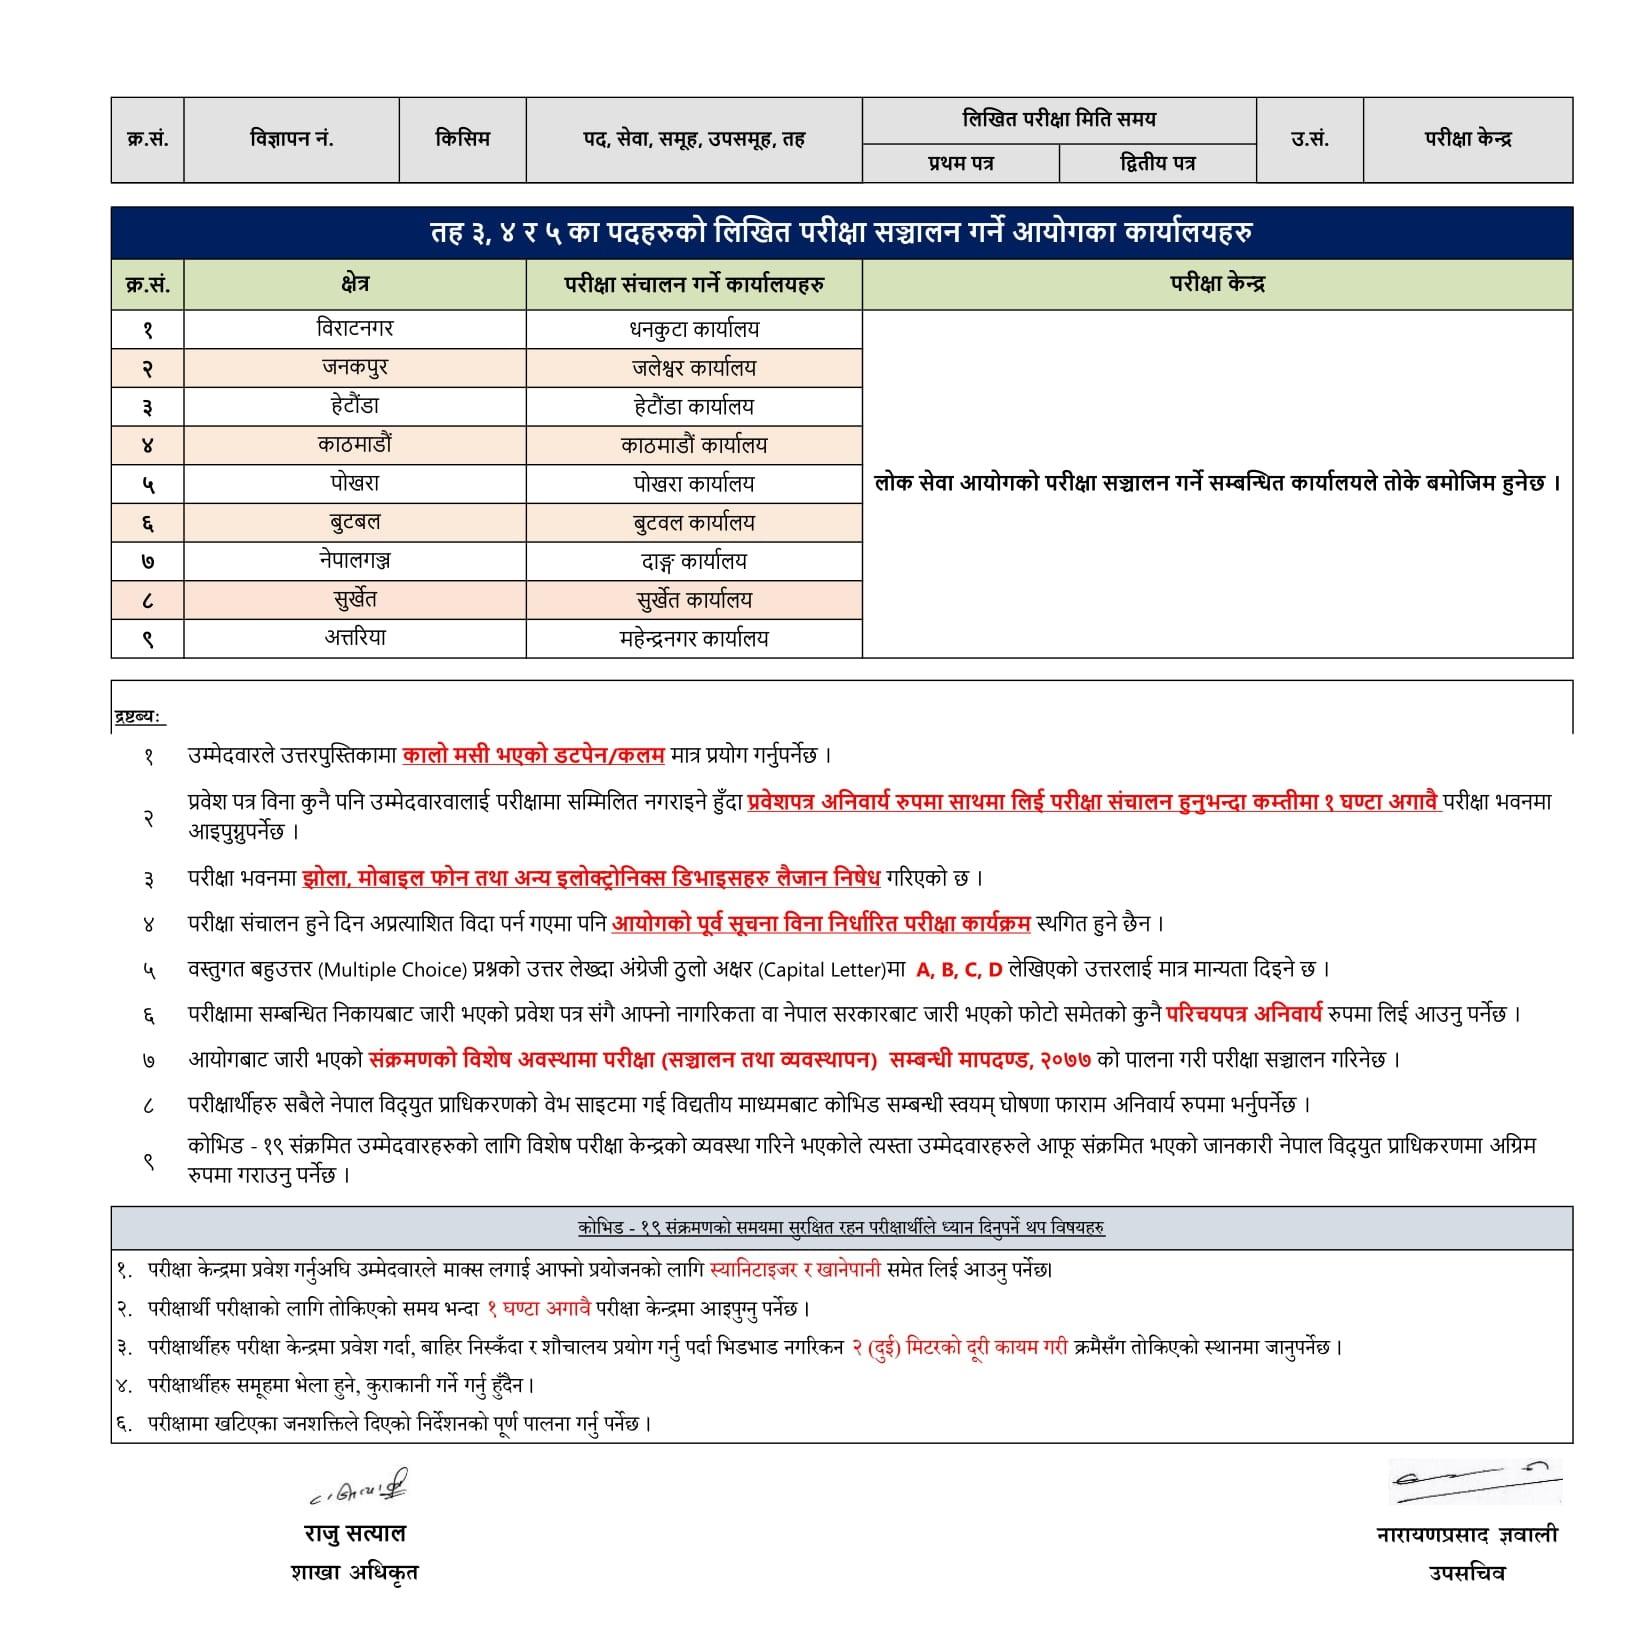 Nepal Electricity Authority (NEA) Level 3, 4 and 5th Written Exam Notice